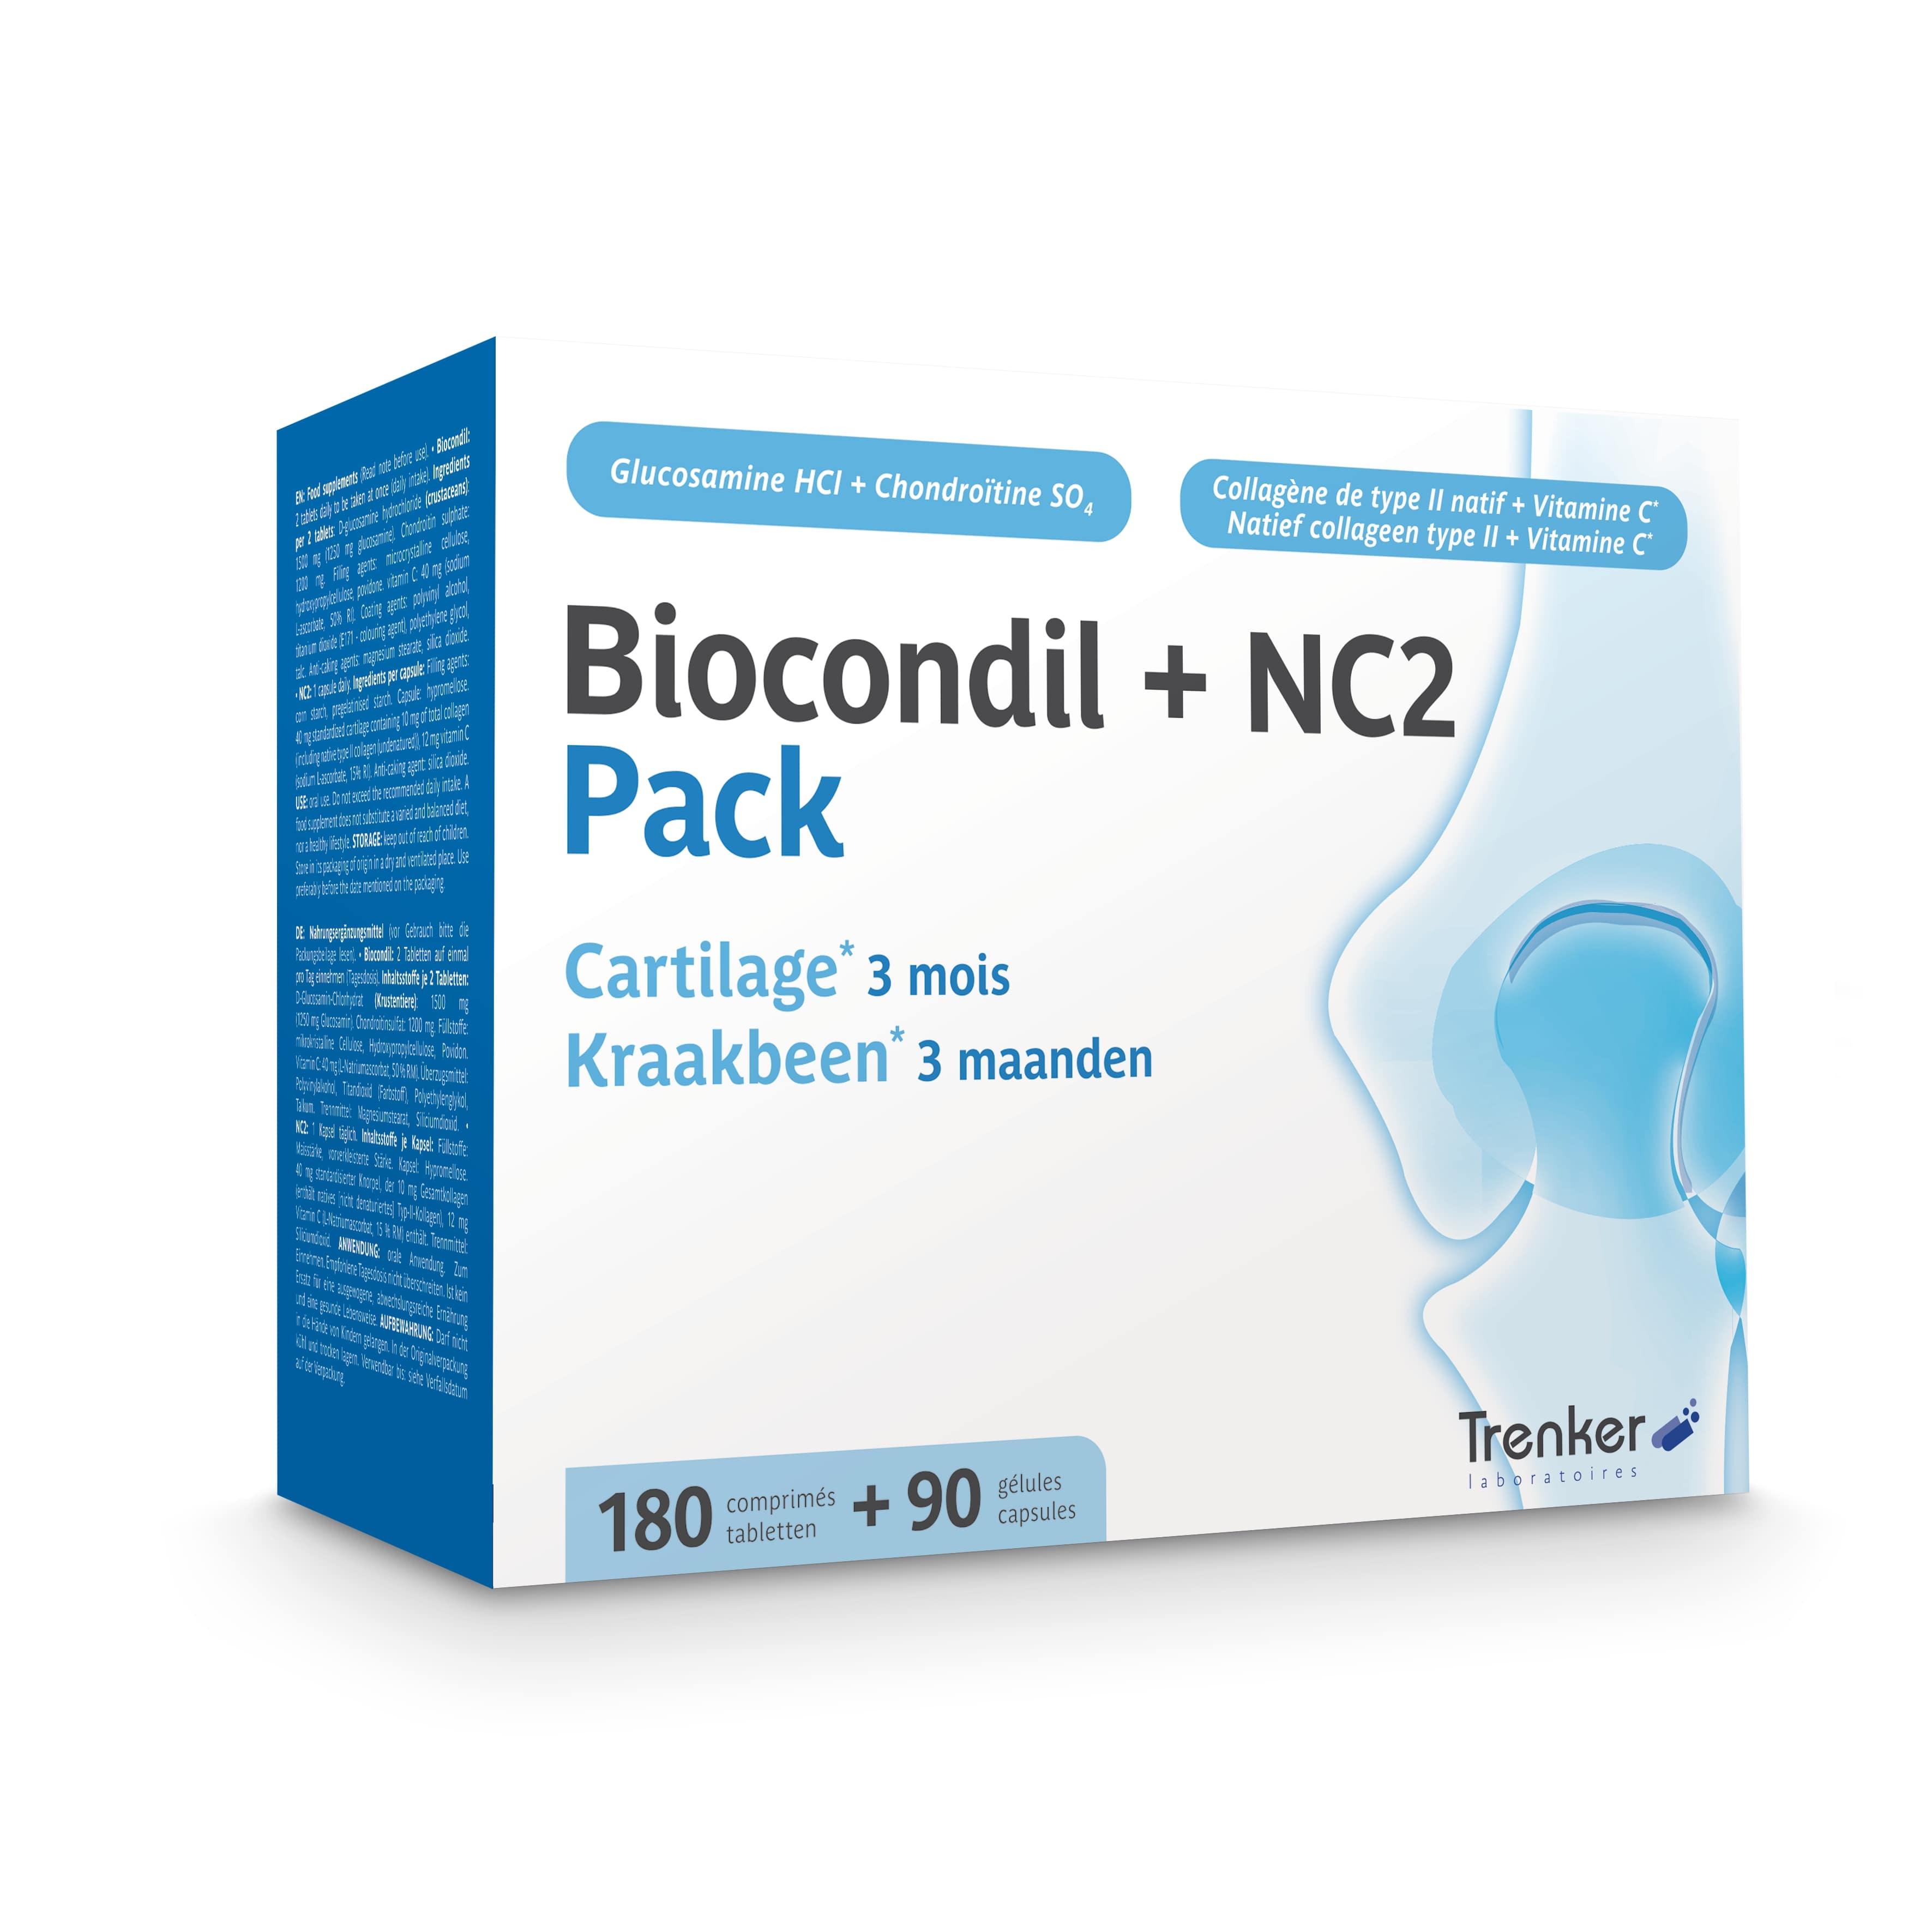 Image of Biocondil+NC2 duo Pack